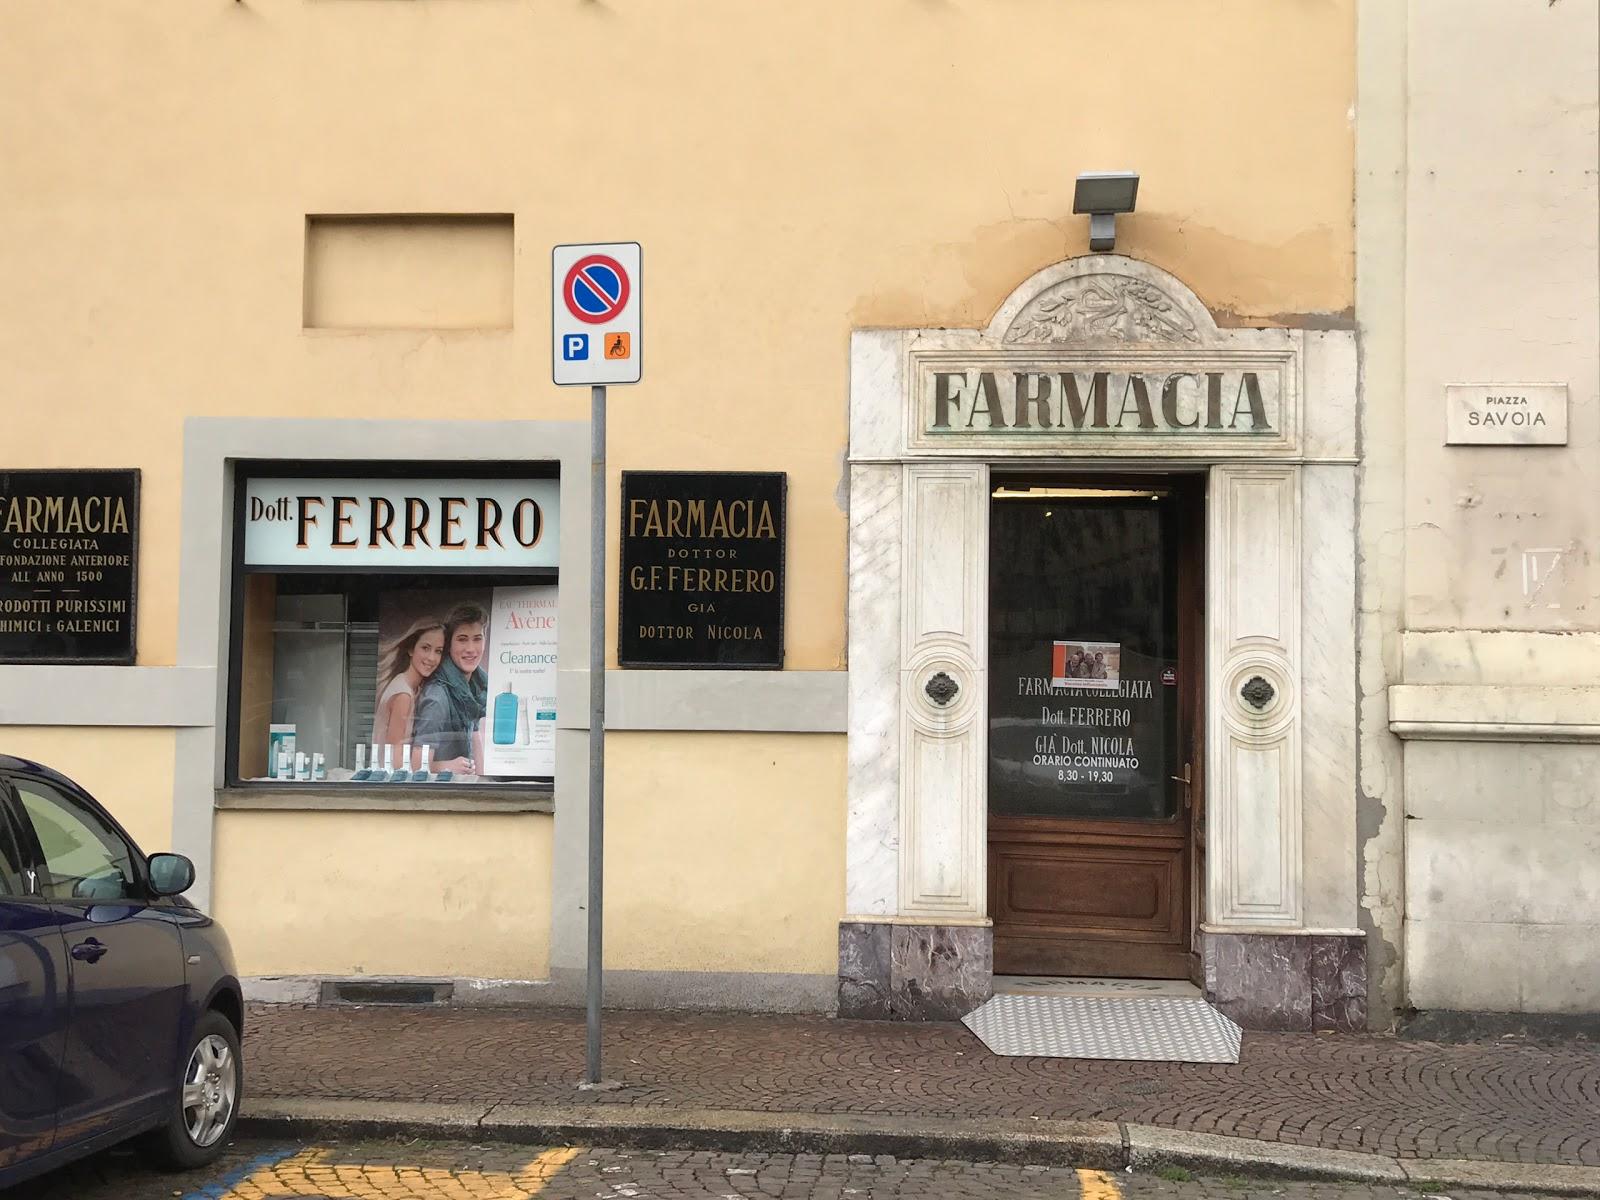 Farmacia Collegiata Dott. Ferrero